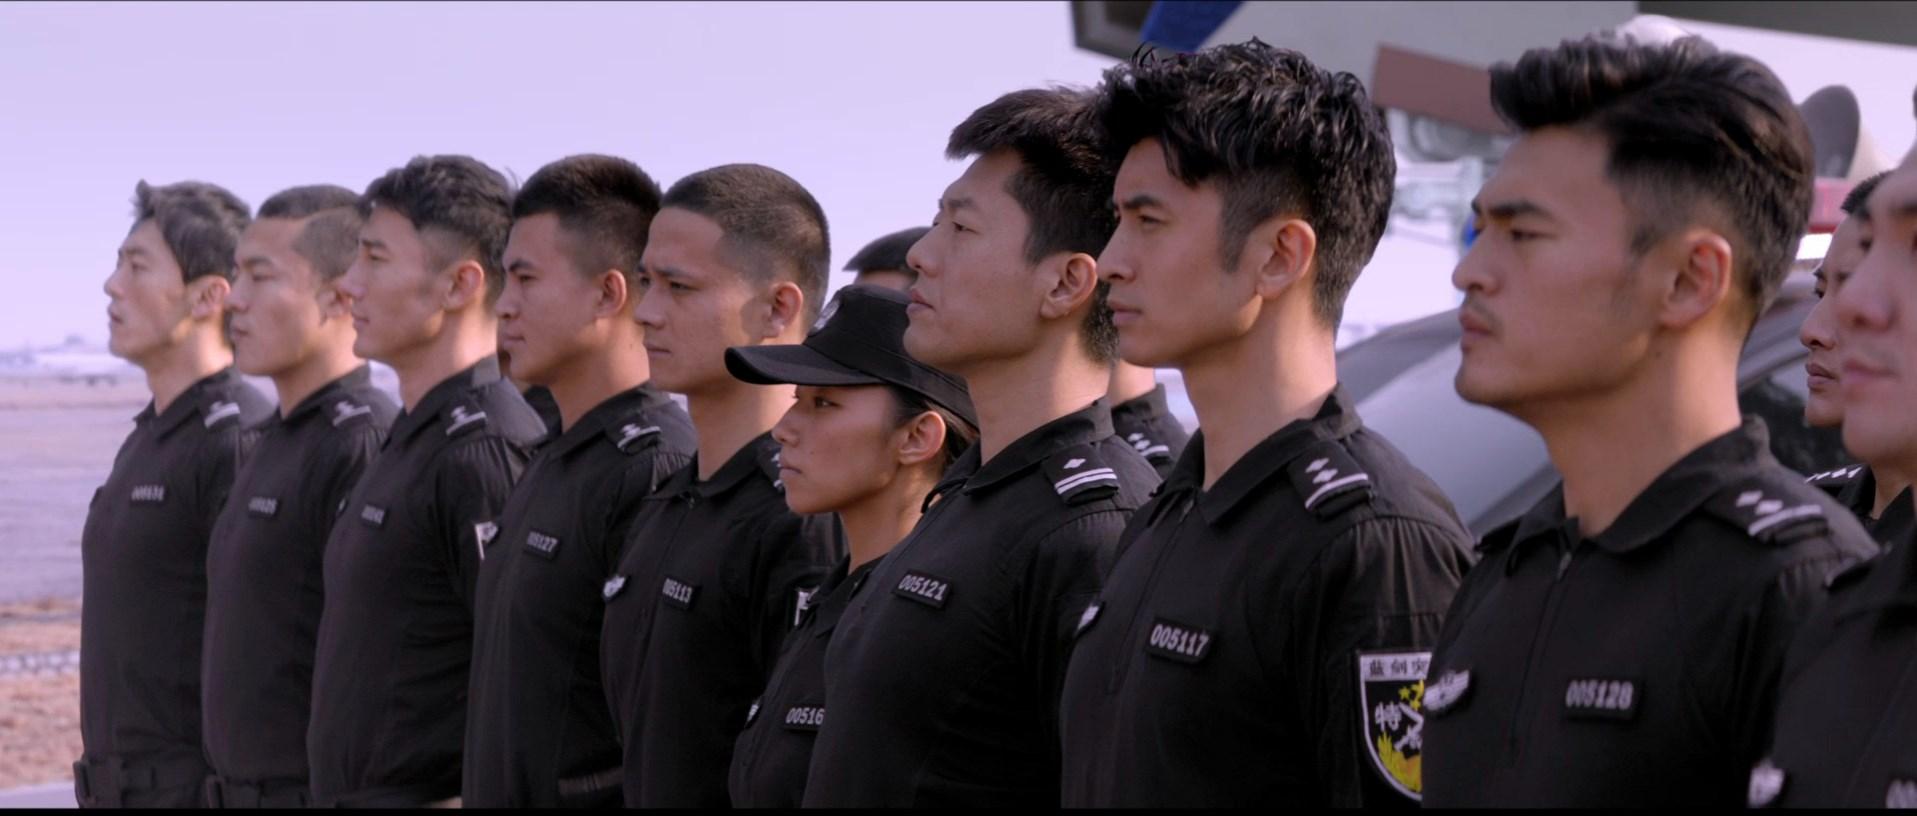 S.W.A.T - Fuerza Letal (2019) 1080p WEB-DL AMZN Latino